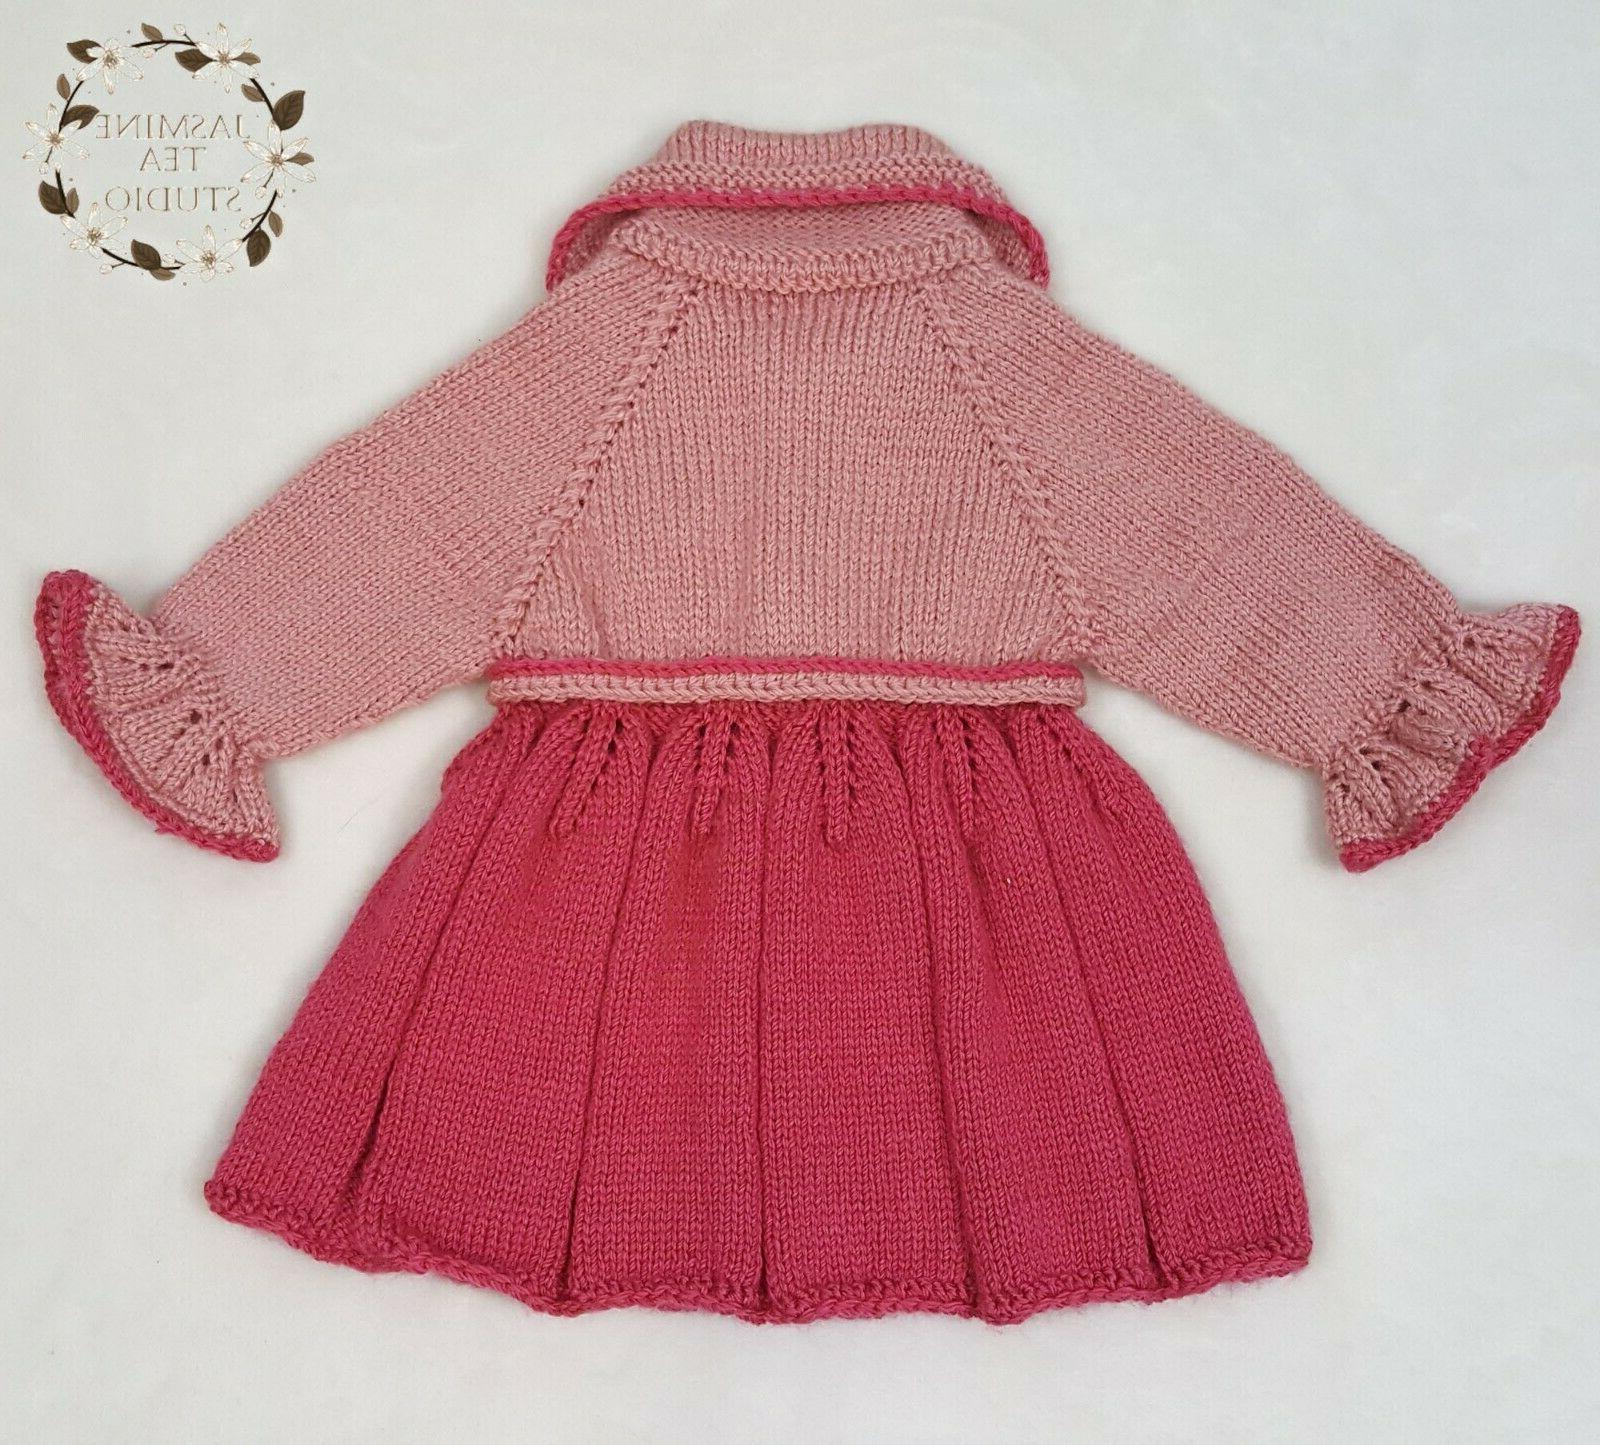 Present Knitted Handmade